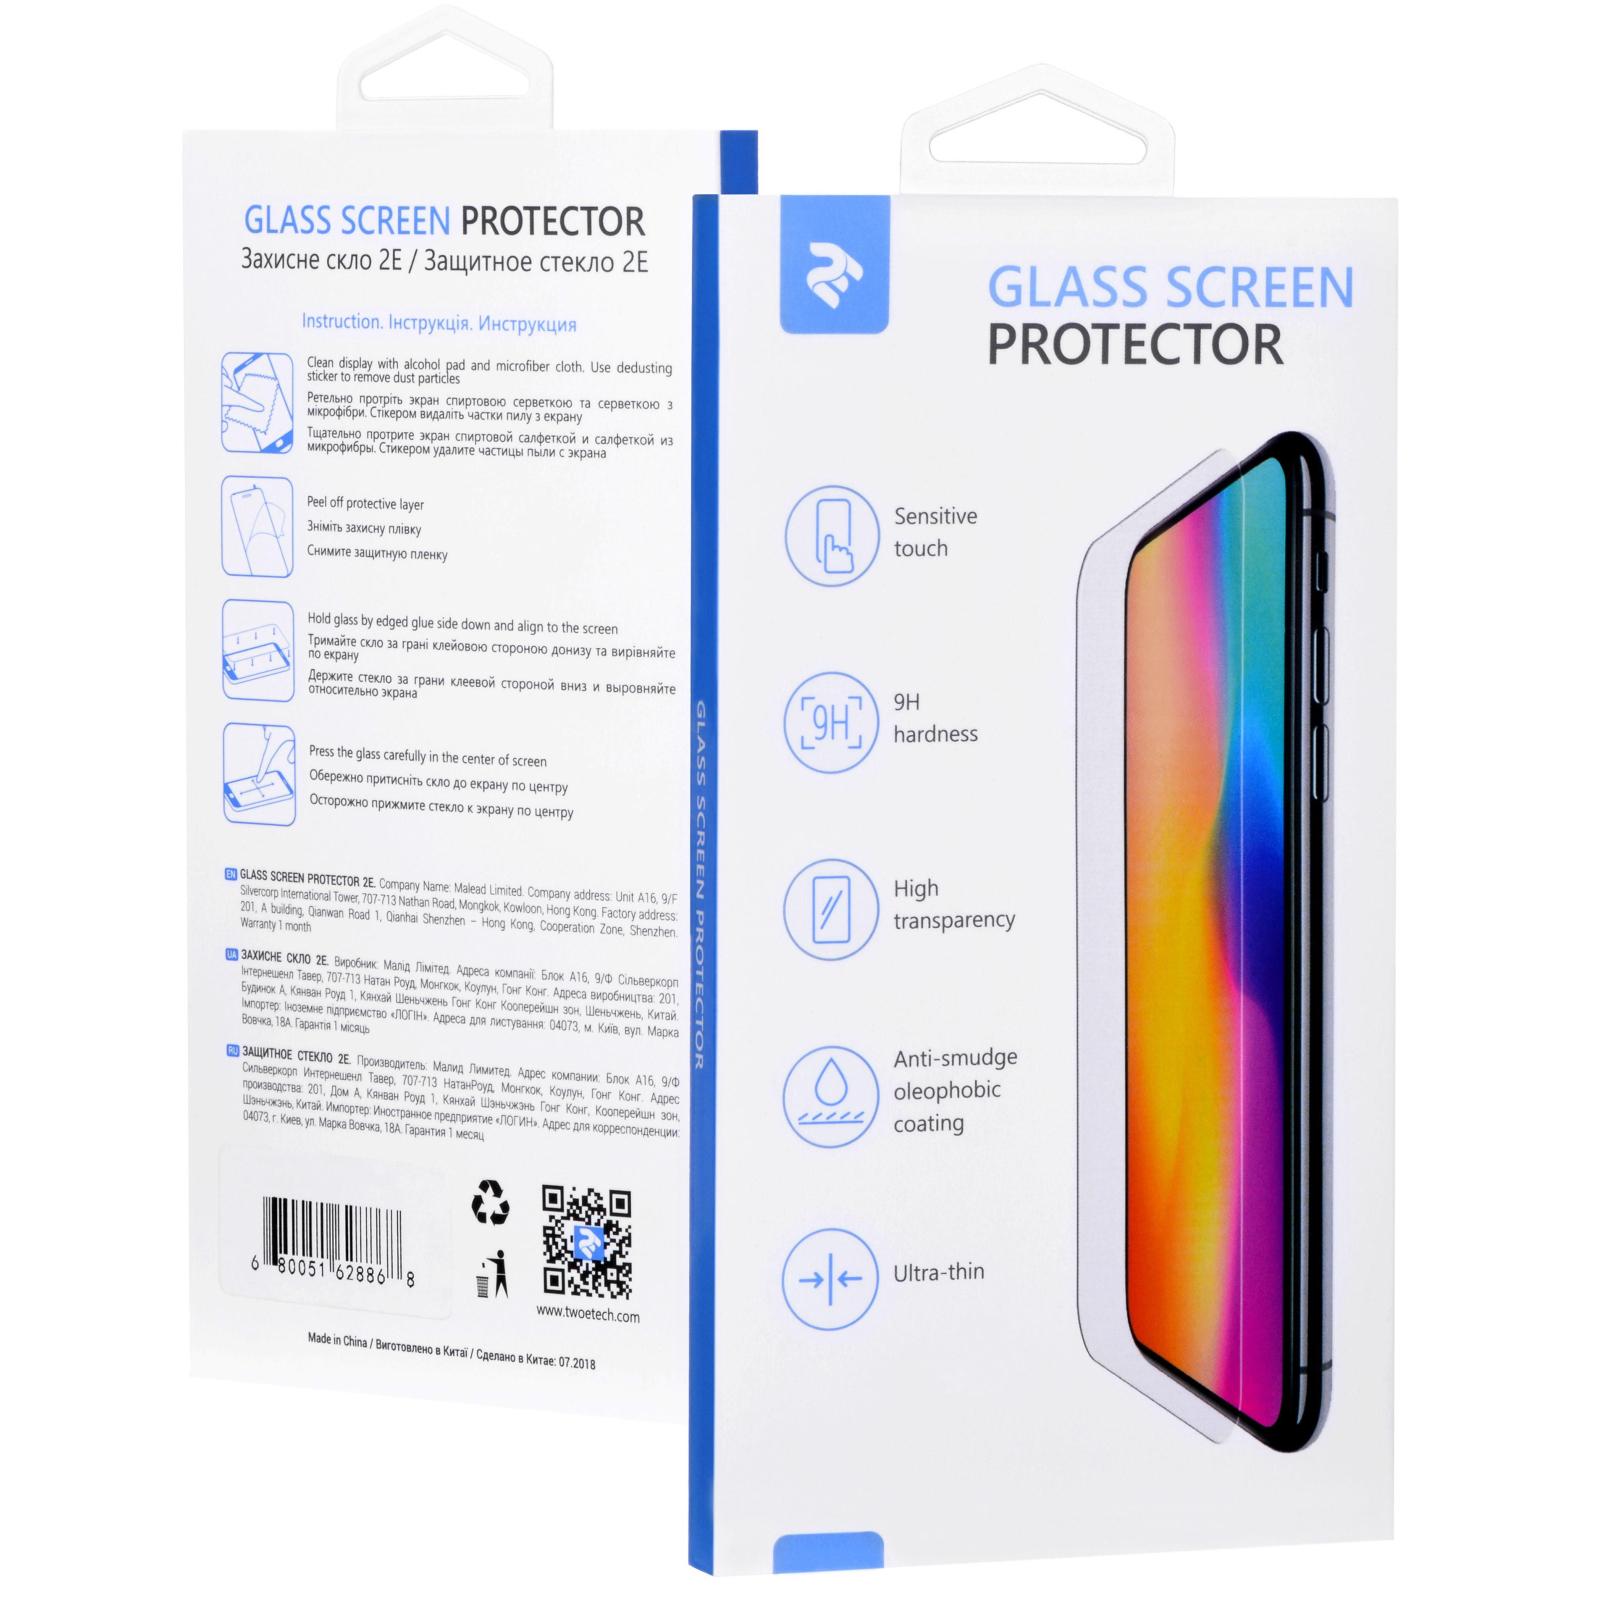 Стекло защитное 2E для Huawei P20 Lite 3D Edge Glue (2E-TGHW-P20L-3D)